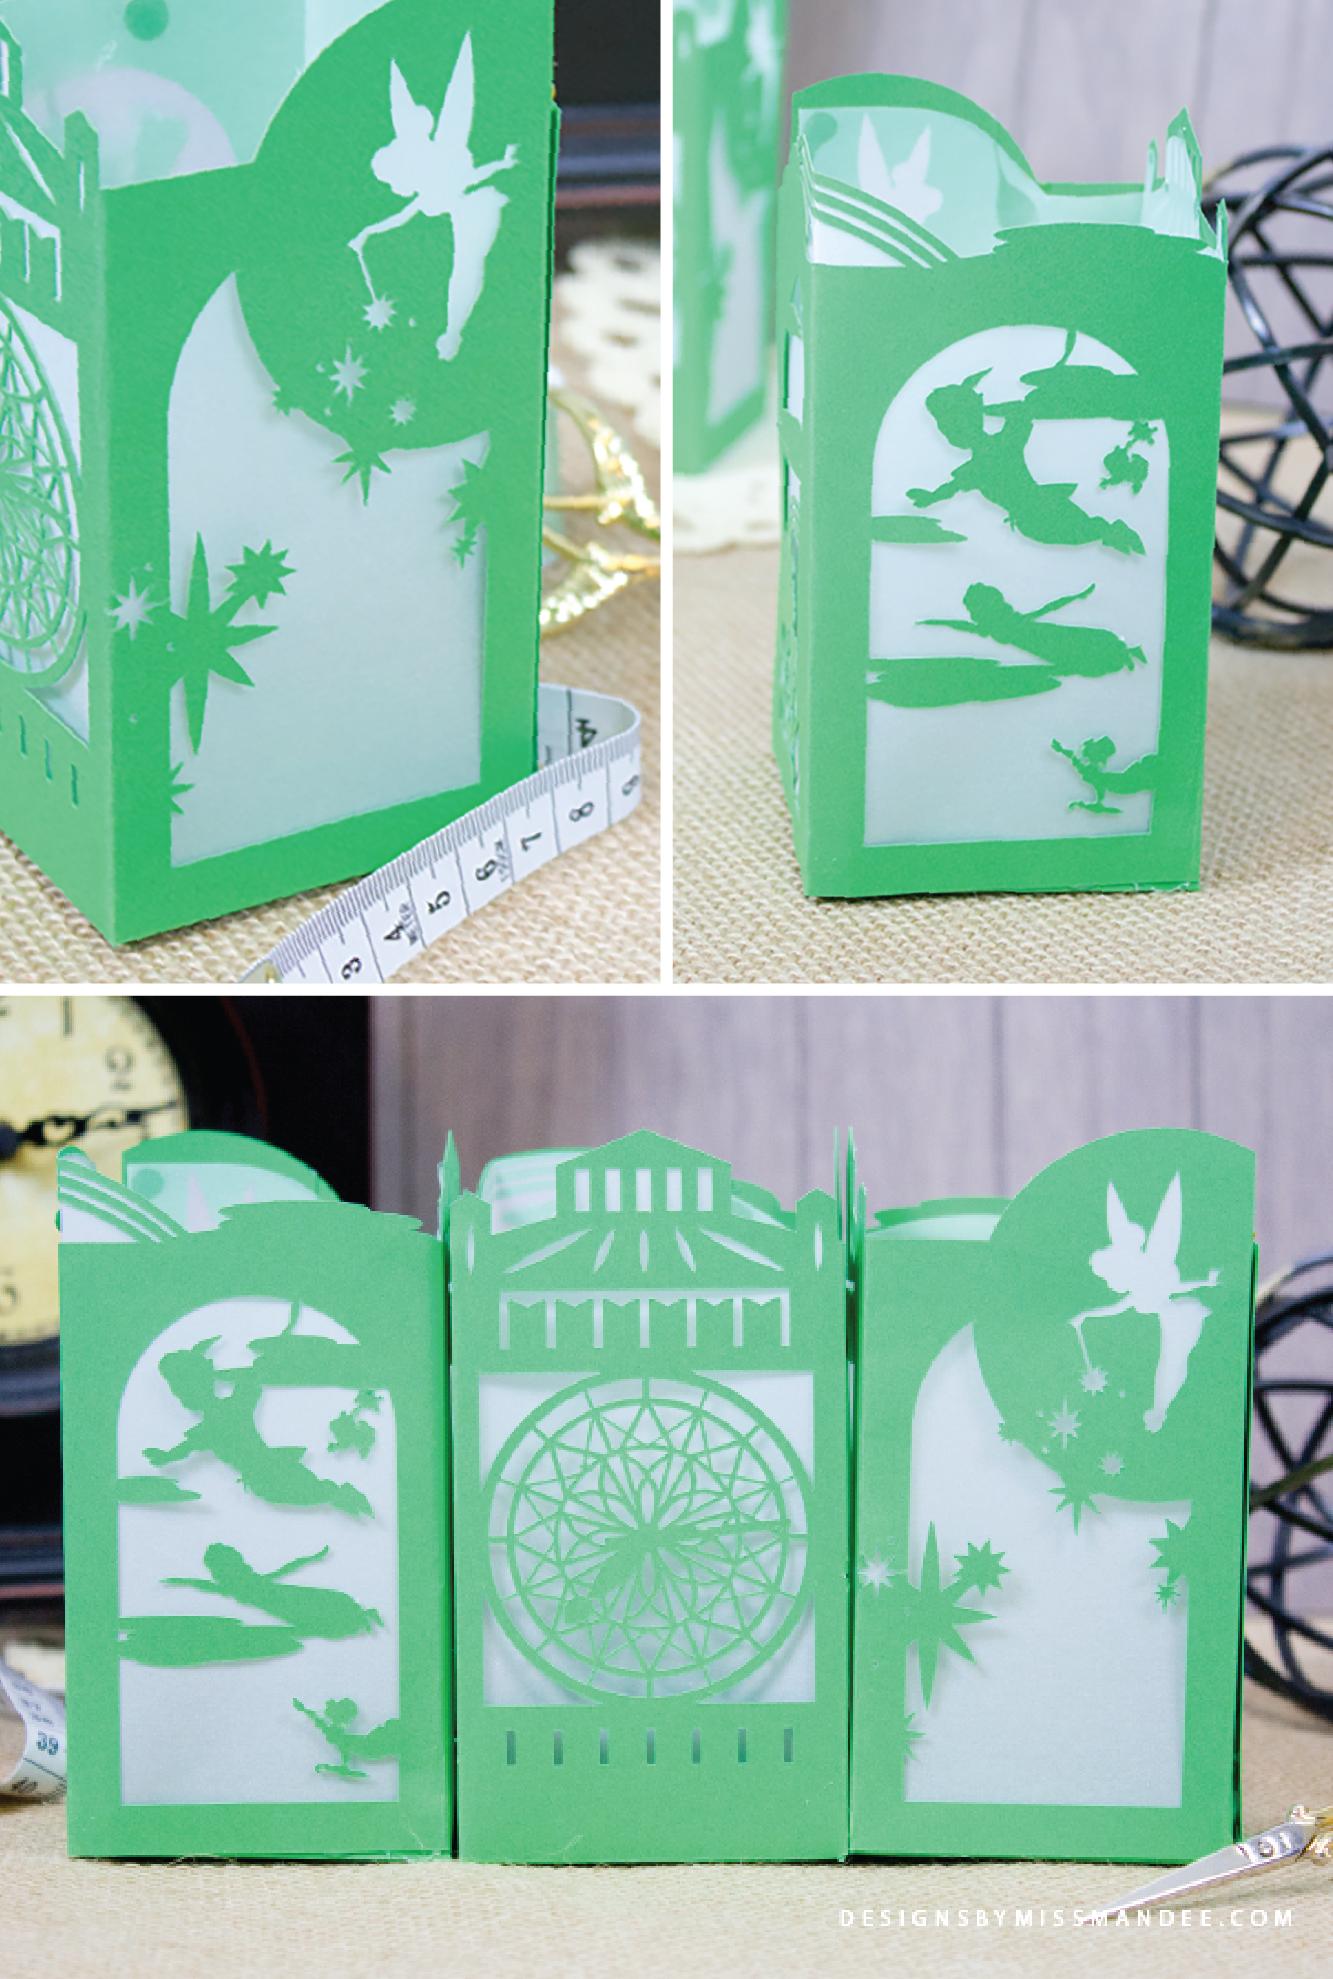 Peter Pan Paper Lantern Cricut Paper Cricut Paper Lanterns